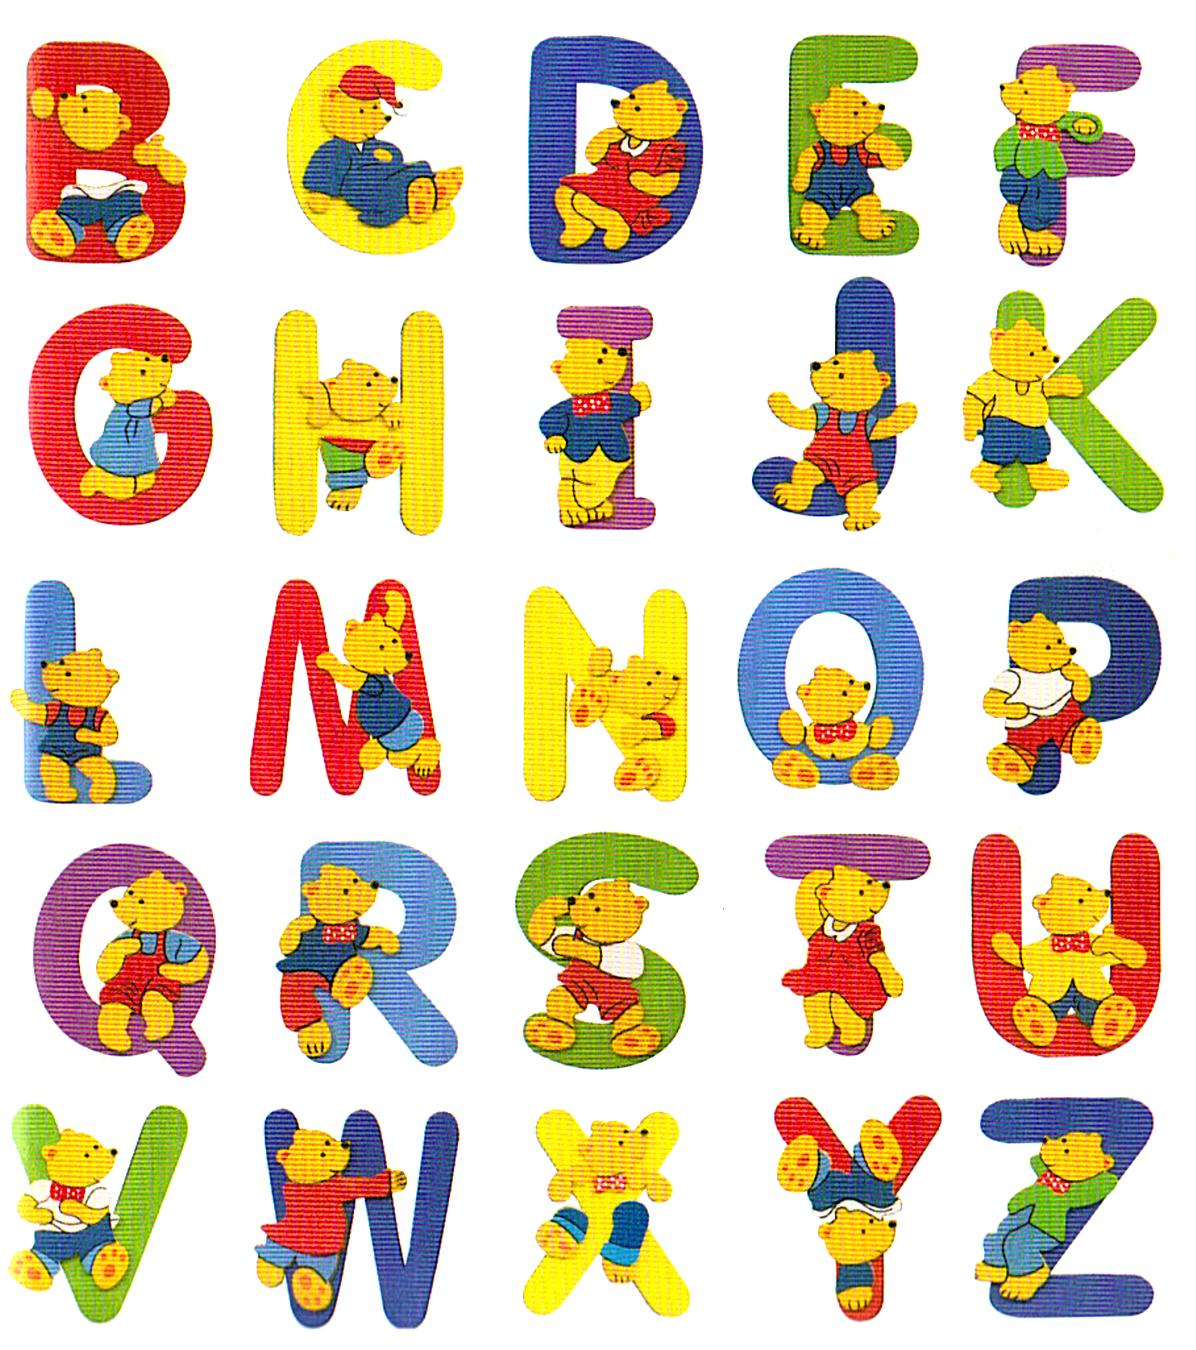 Ba da web letras do alfabeto desenhos e molde para colorir - Letras decorativas para habitaciones infantiles ...